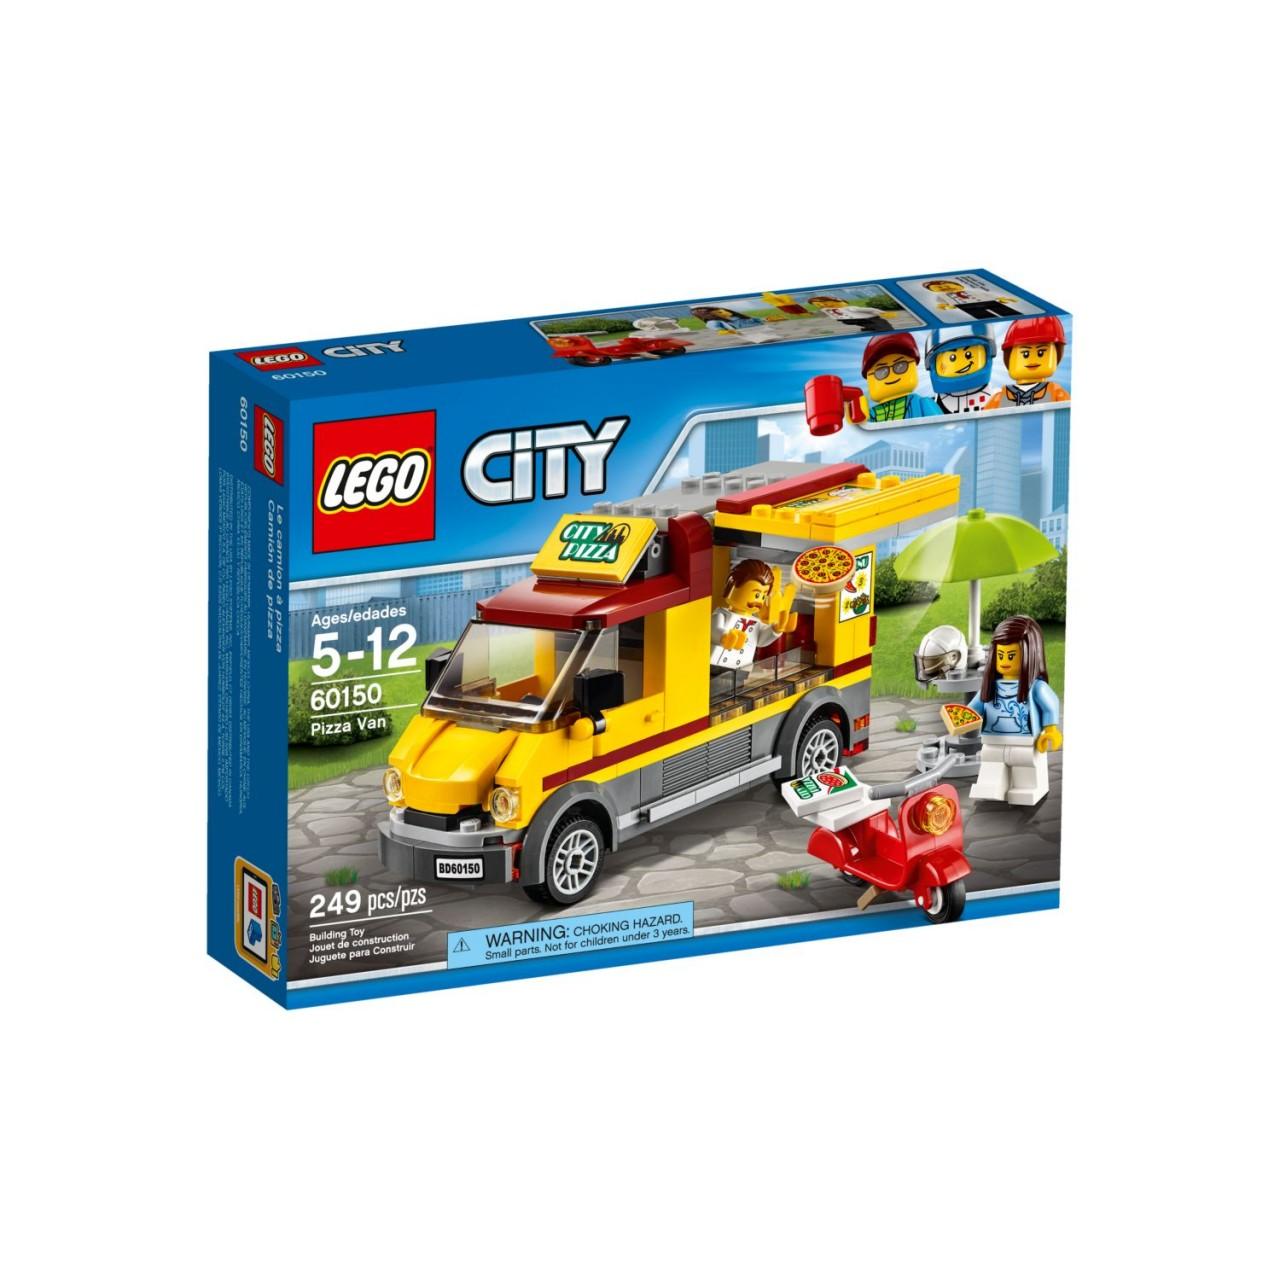 LEGO CITY 60150 Pizzawagen